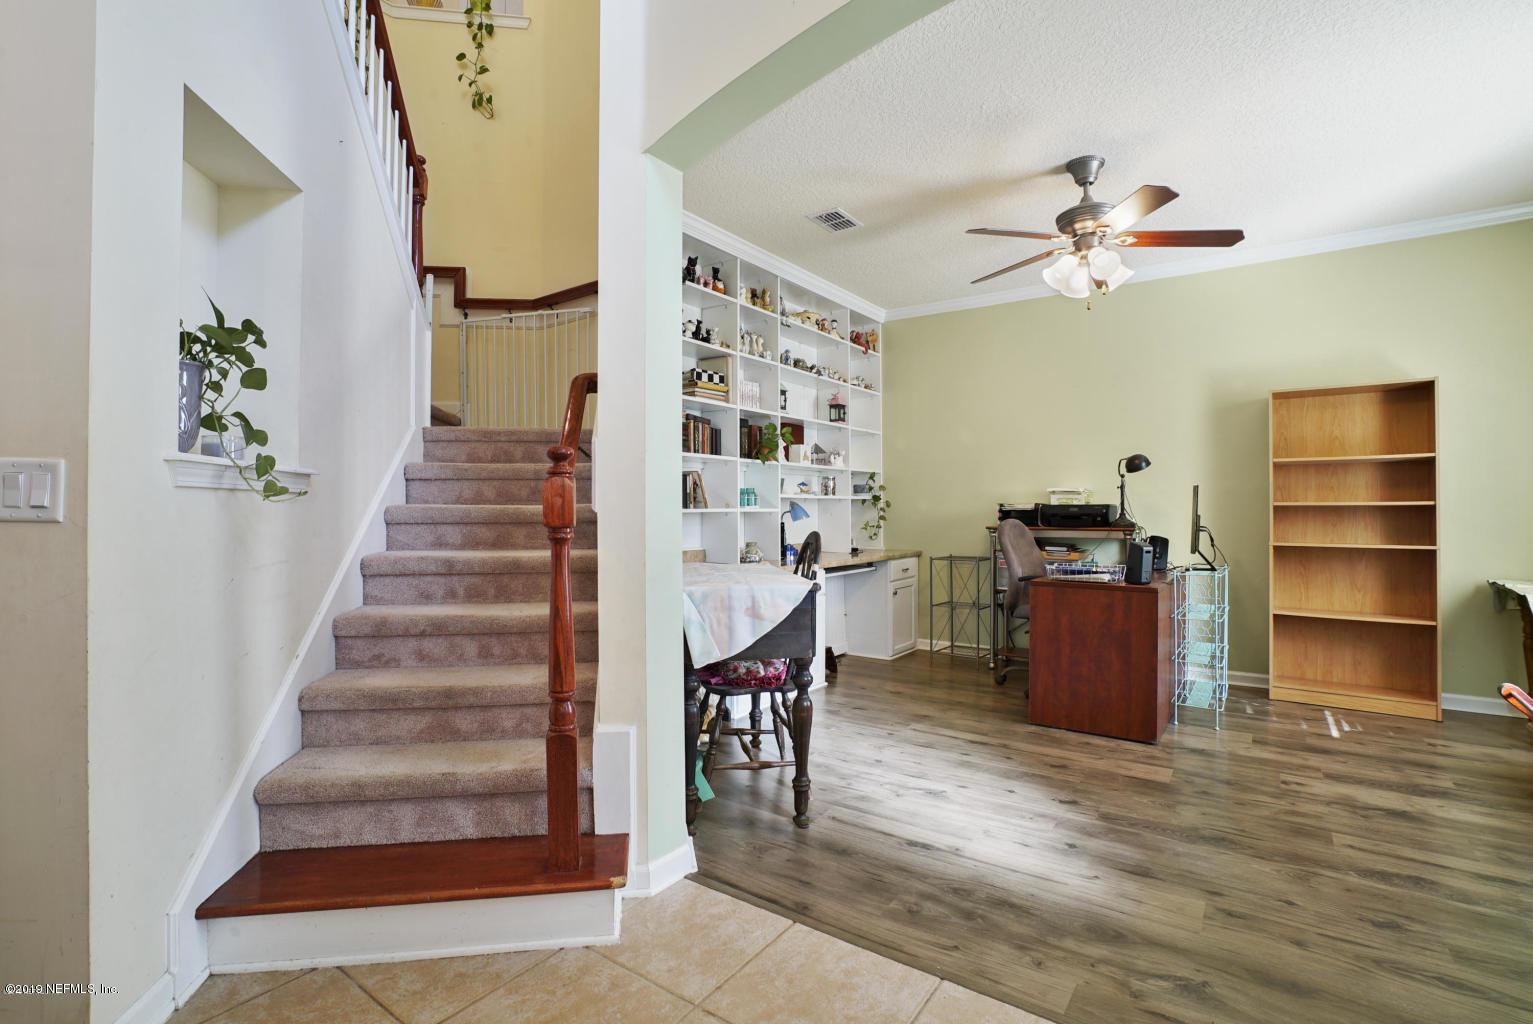 2536 CREEKFRONT, GREEN COVE SPRINGS, FLORIDA 32043, 4 Bedrooms Bedrooms, ,3 BathroomsBathrooms,Residential - single family,For sale,CREEKFRONT,981127